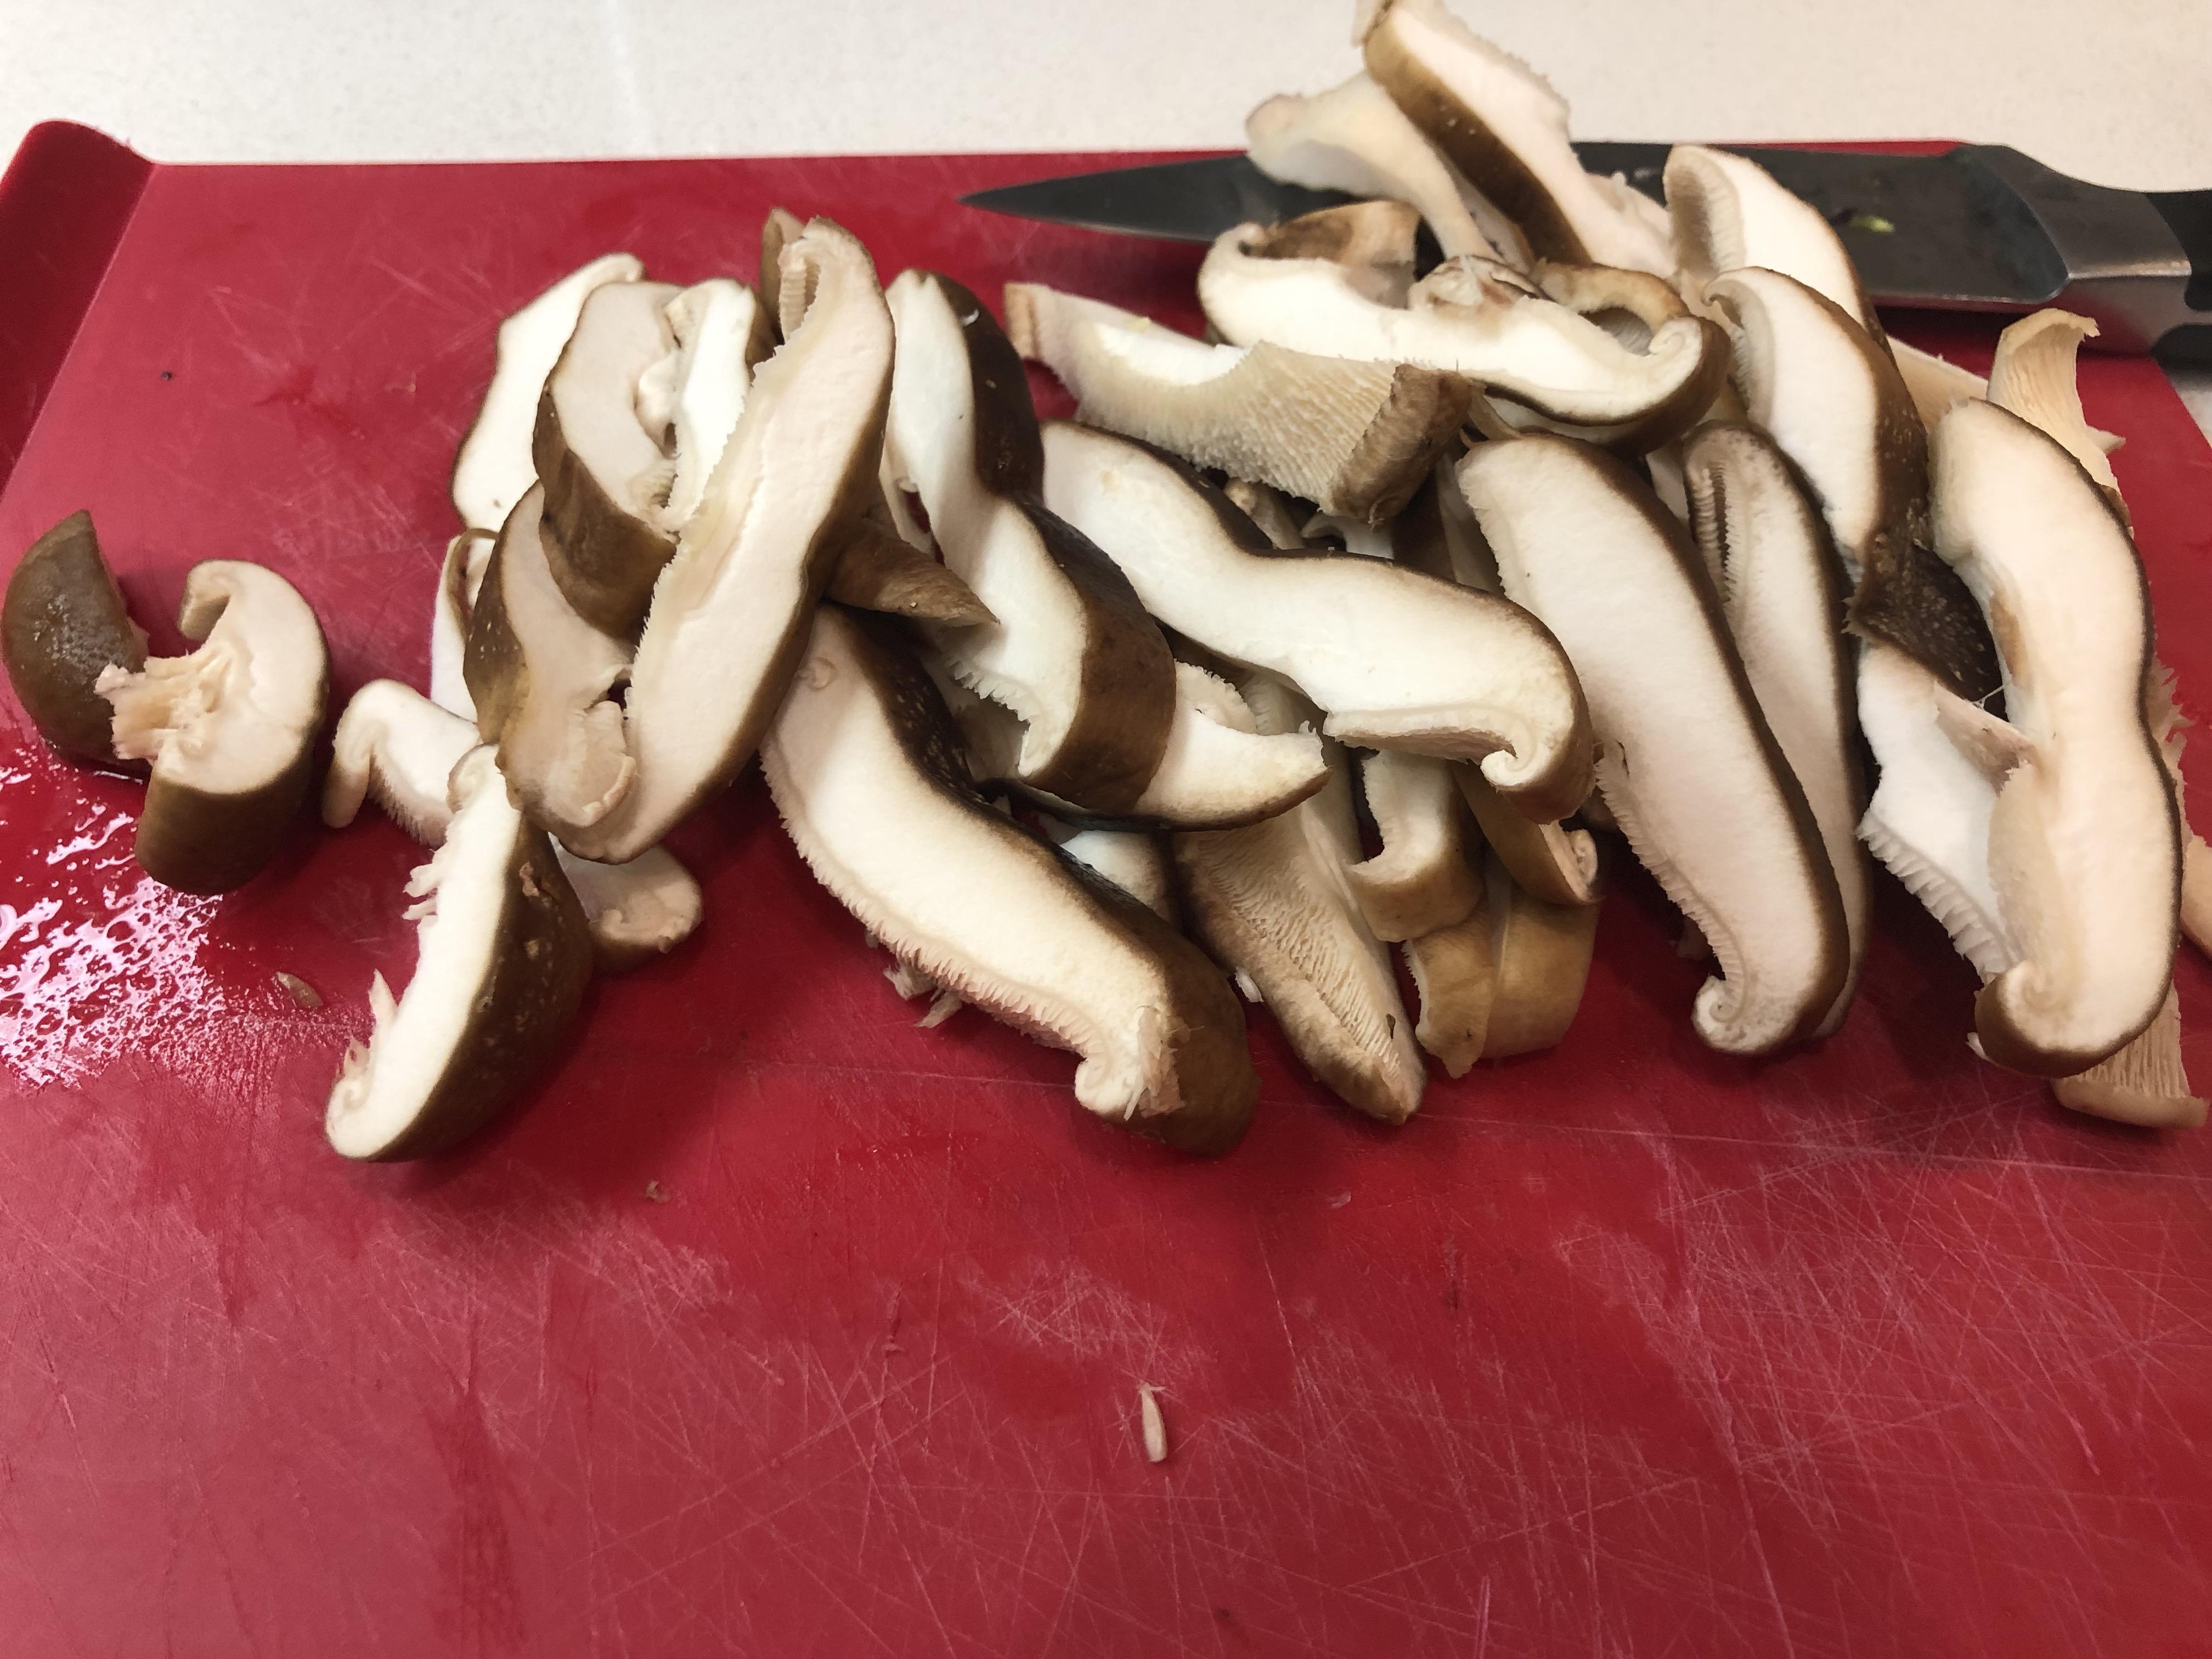 Sliced mushrooms are important